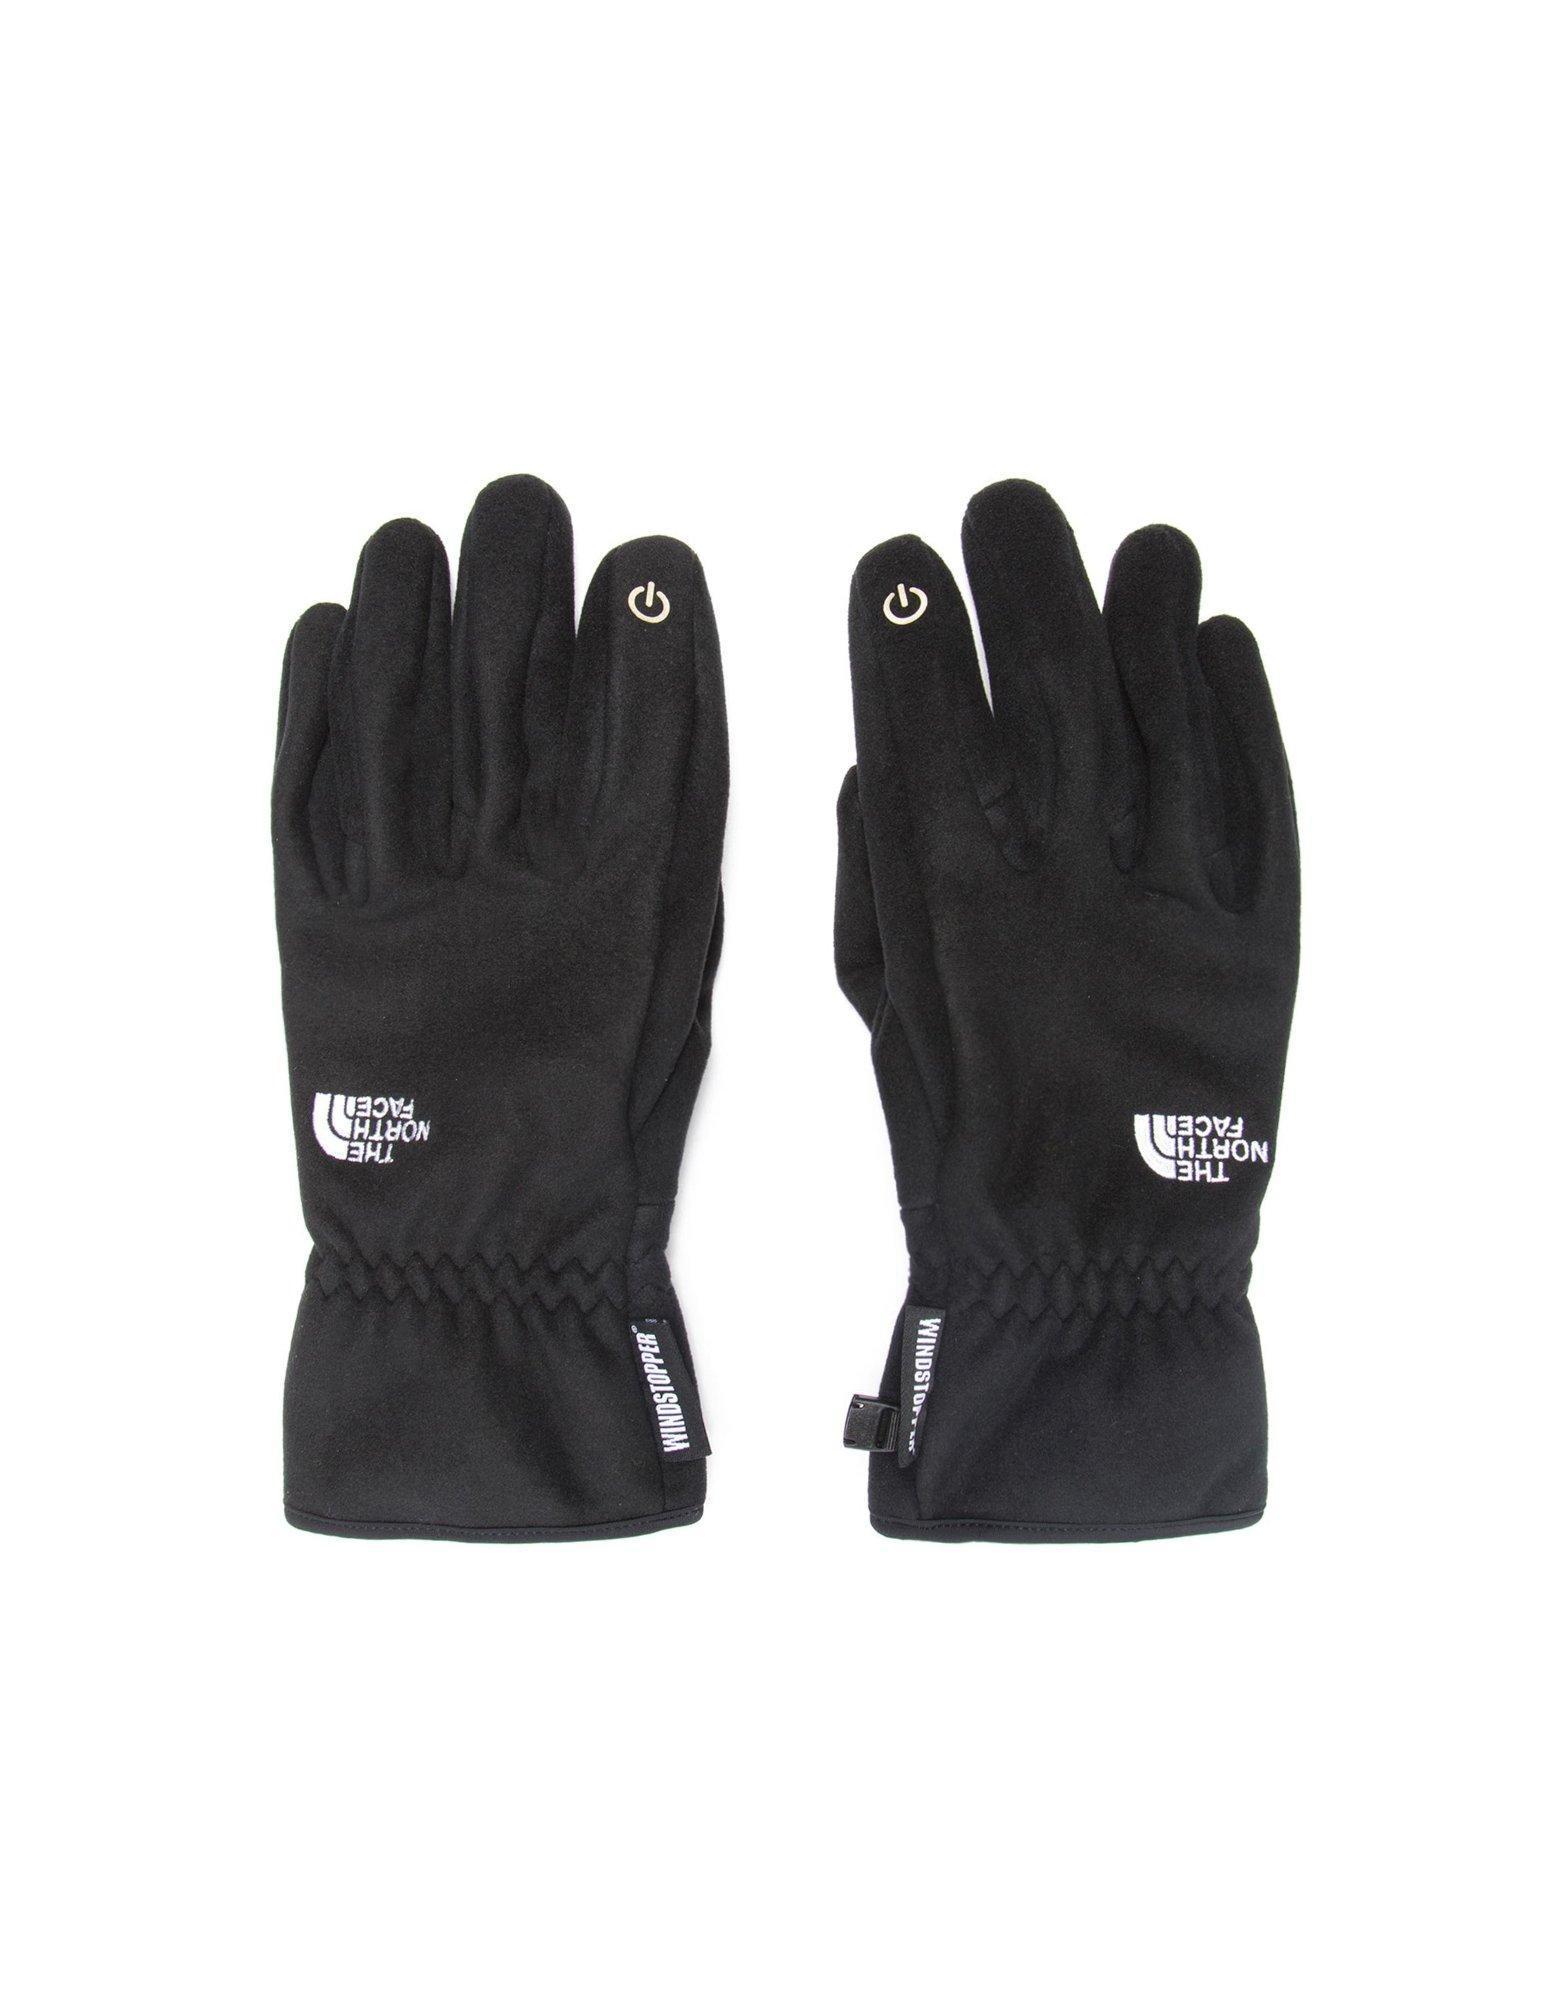 d6f85382bb5 Lyst - The North Face Pamir Windstopper E-tip Gloves in Black for Men